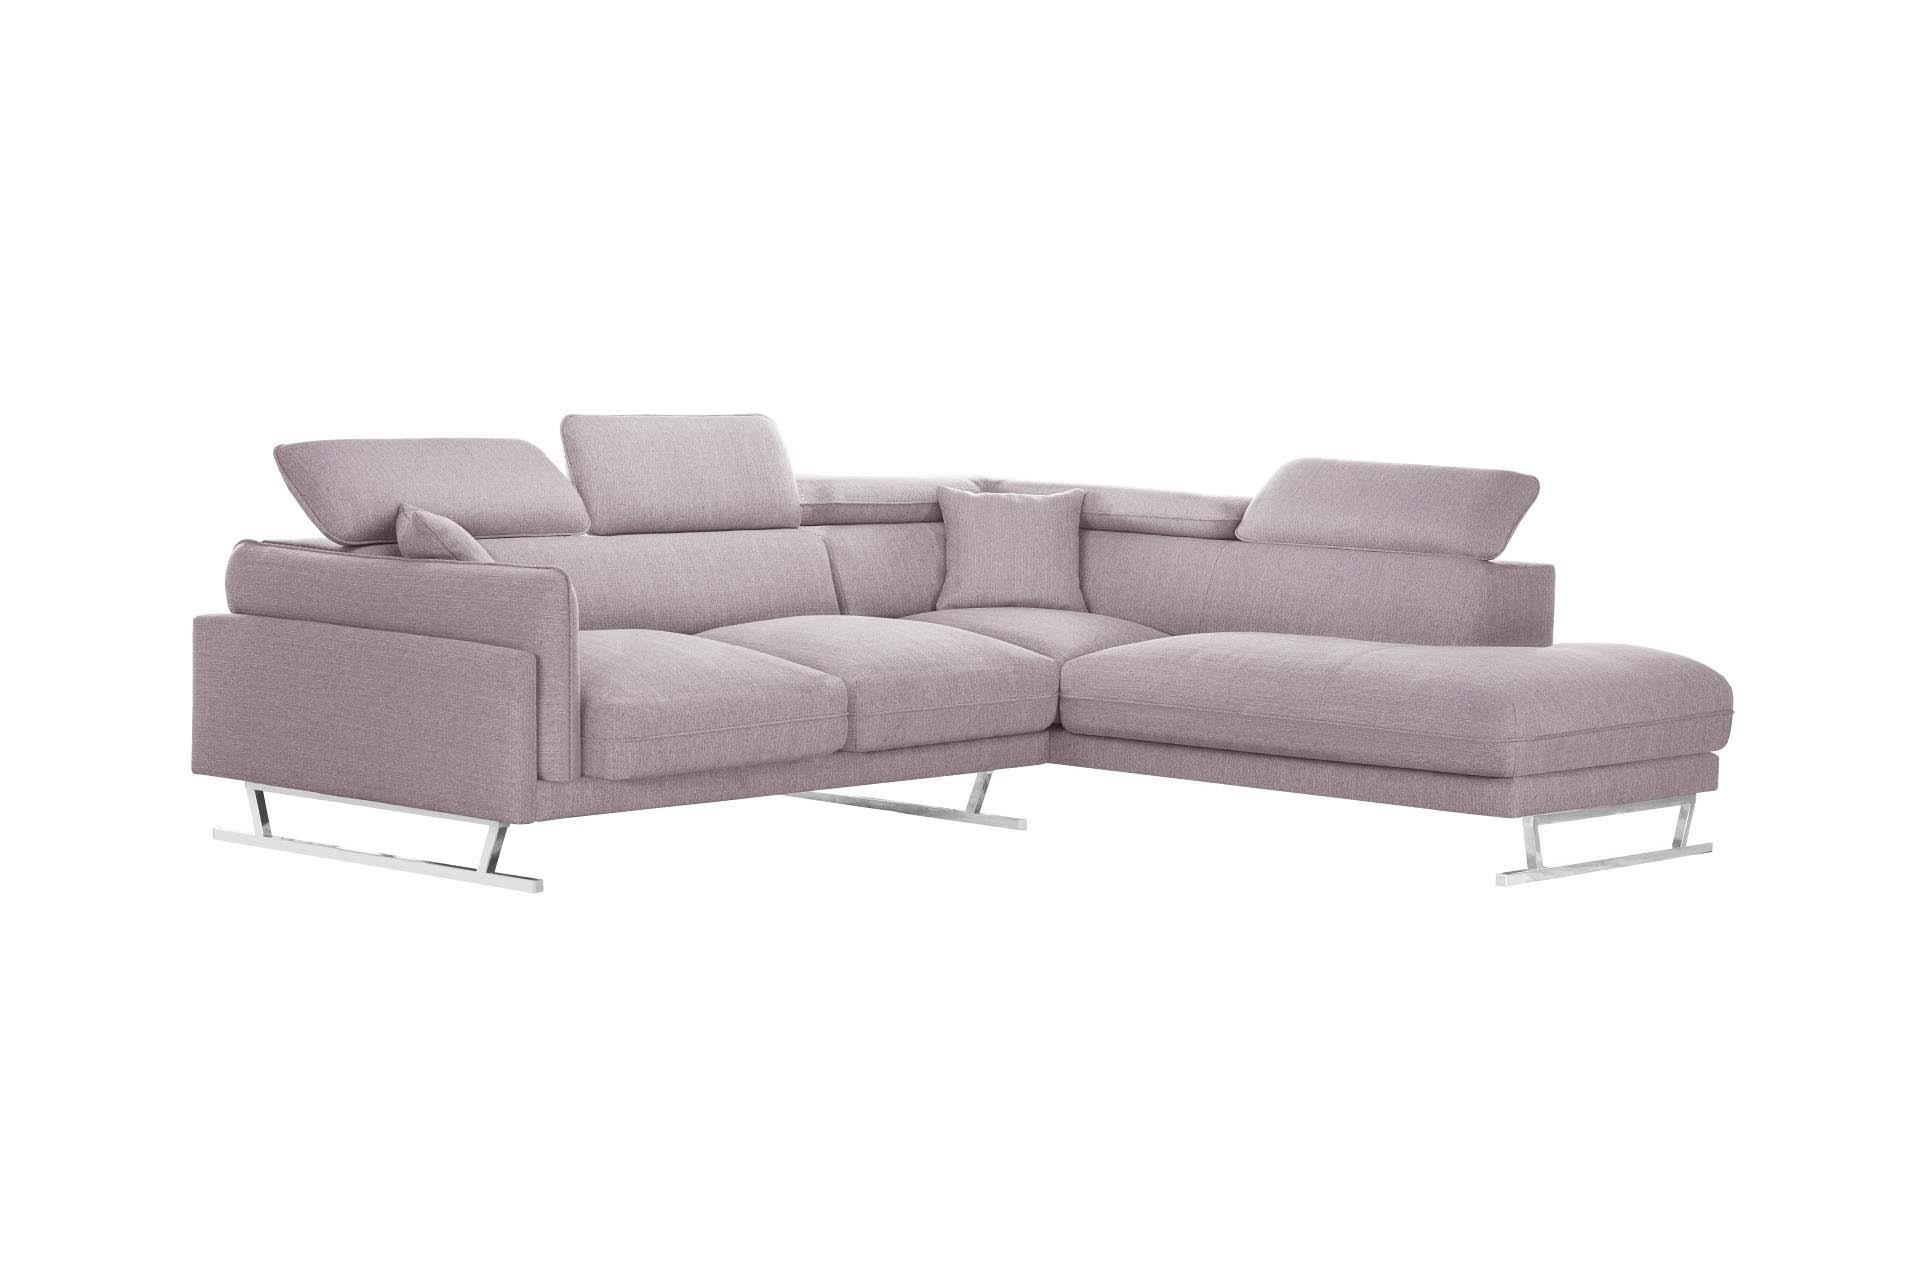 Canapé d'angle 6 places Rose Tissu Luxe Design Confort